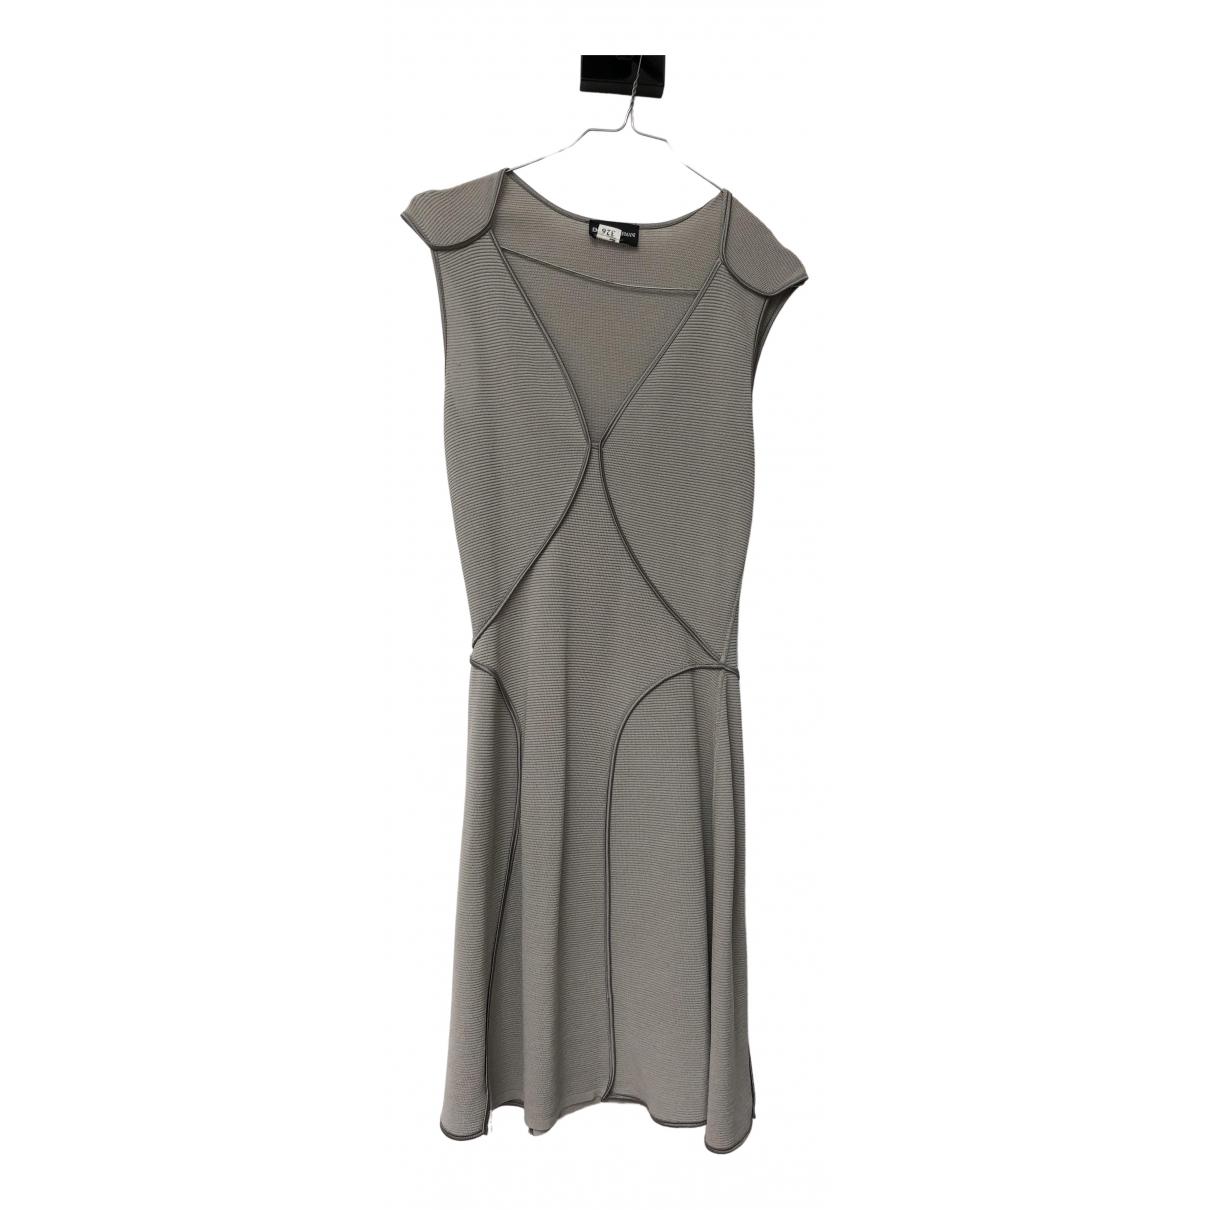 Emporio Armani \N Beige Cotton - elasthane dress for Women 38 FR